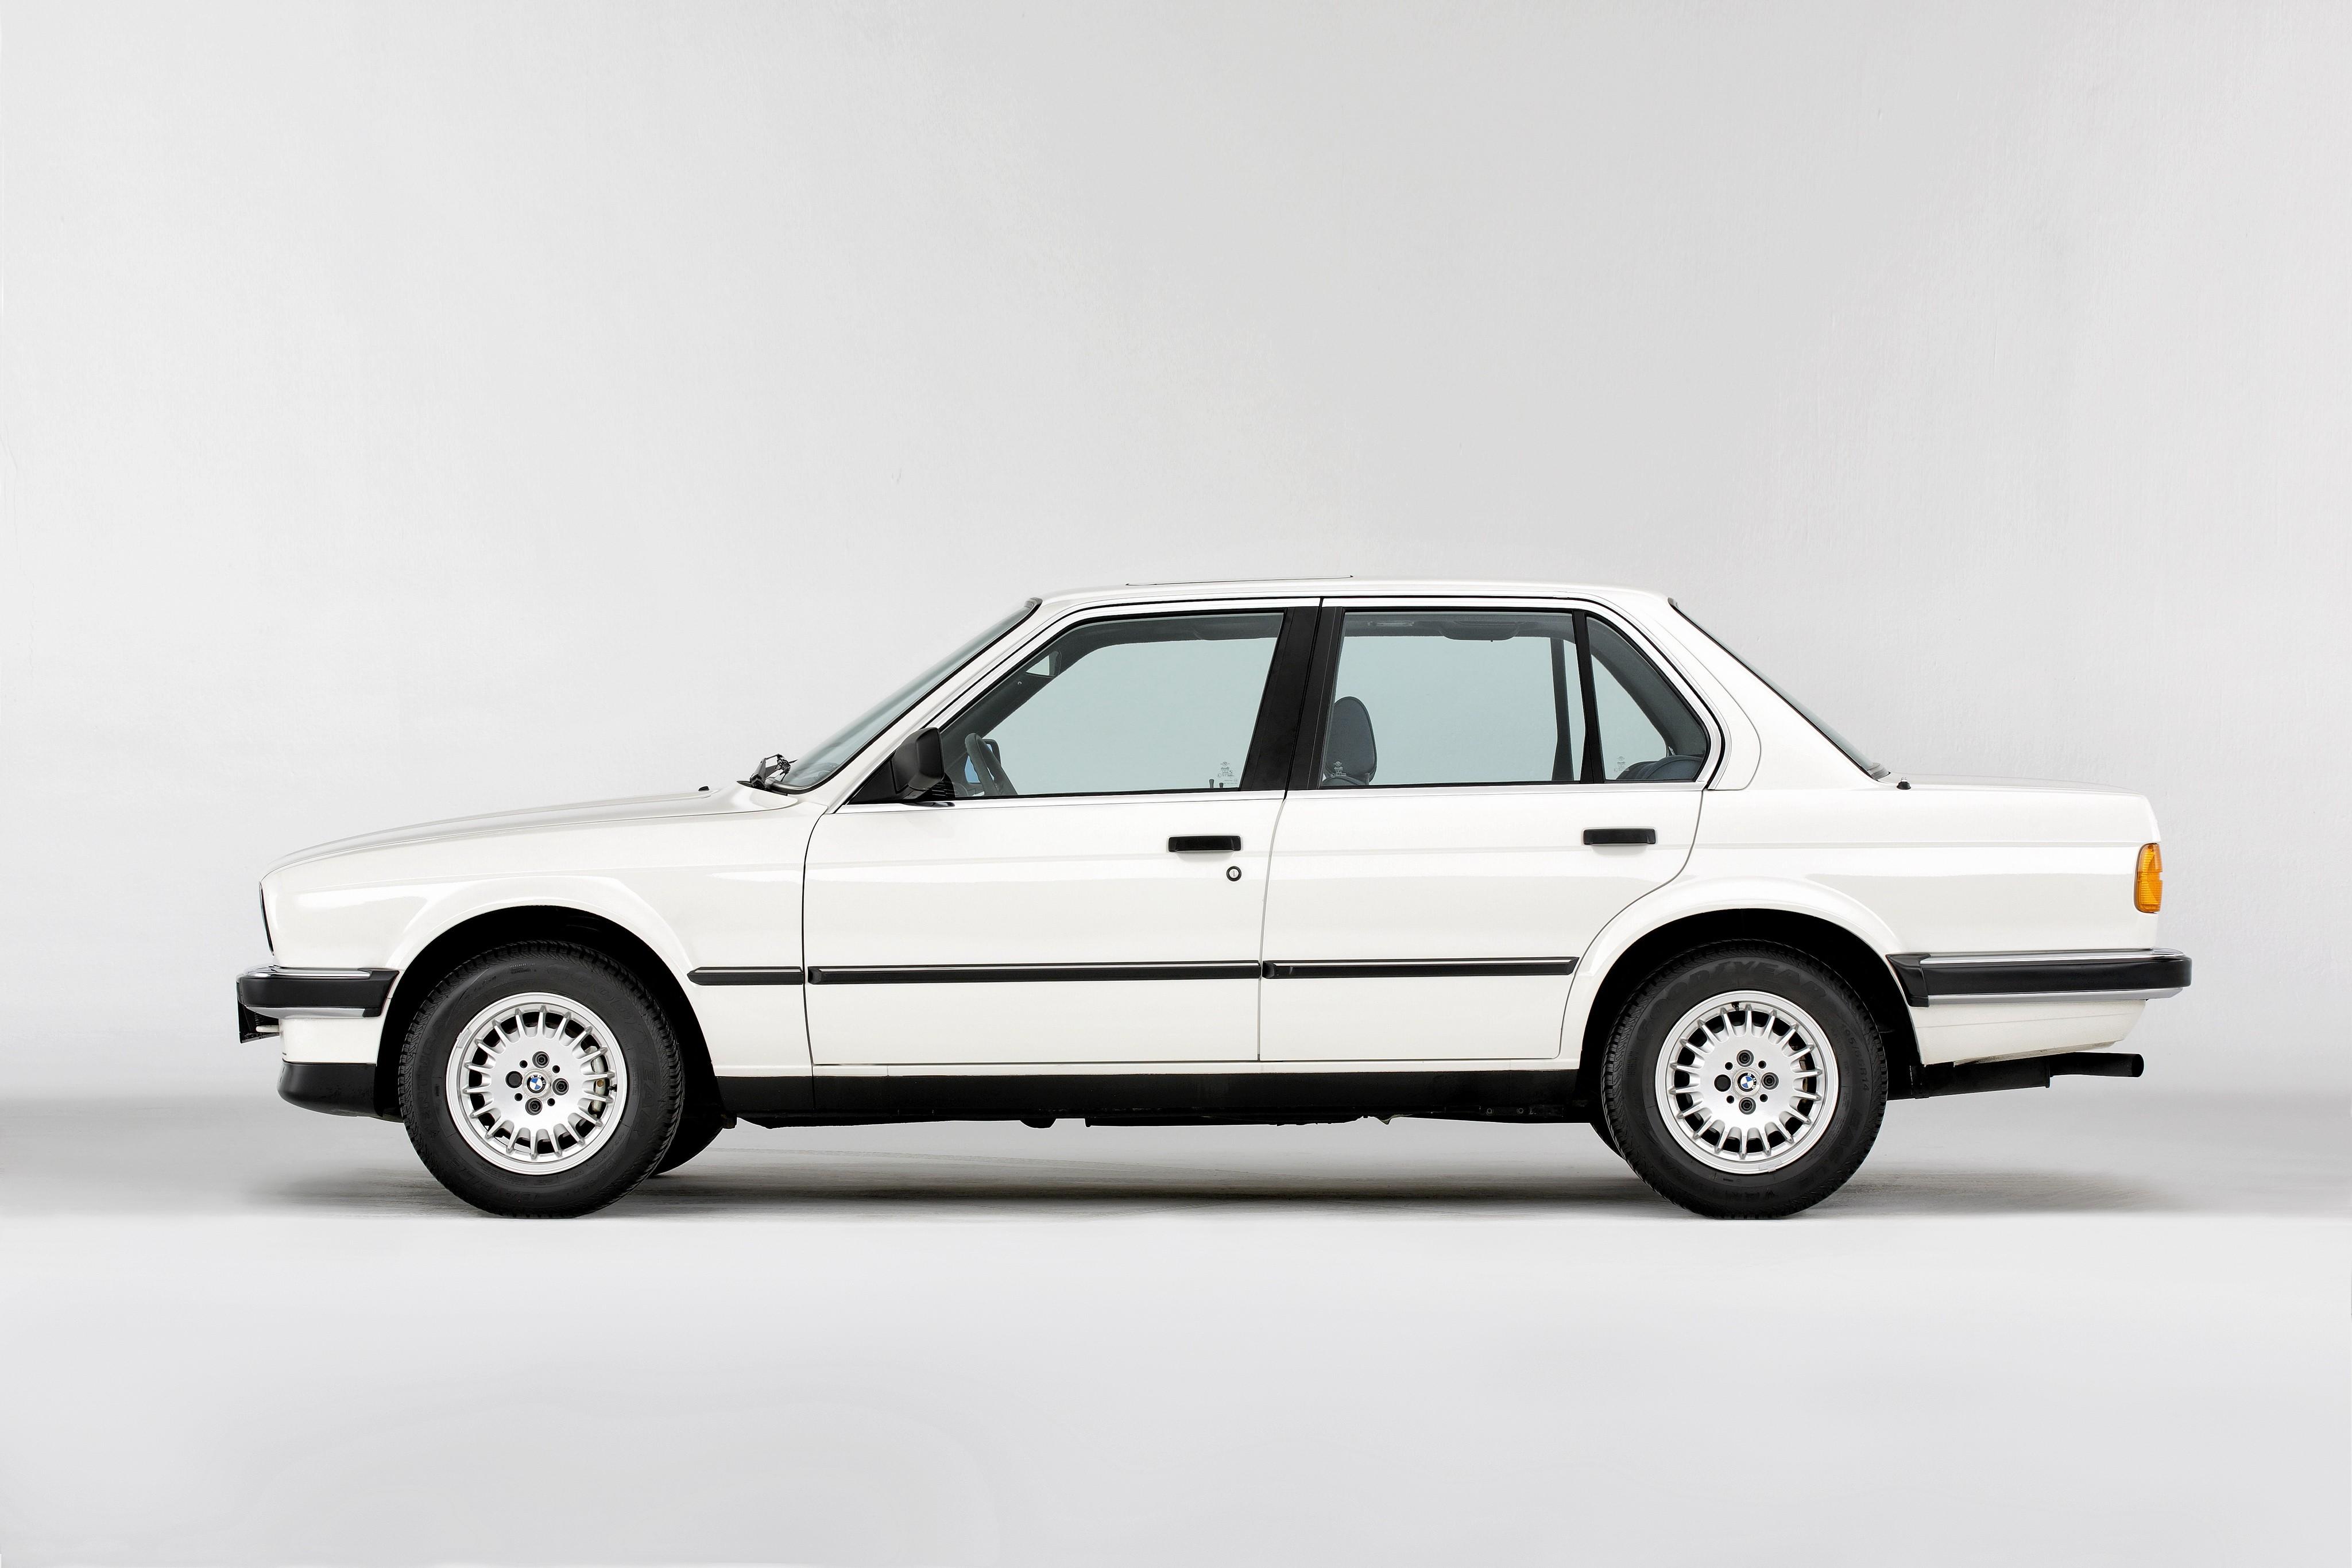 bmw 3 series sedan e30 1982 1983 1984 1985 1986 1987 1988 1989 1990 1991 1992. Black Bedroom Furniture Sets. Home Design Ideas